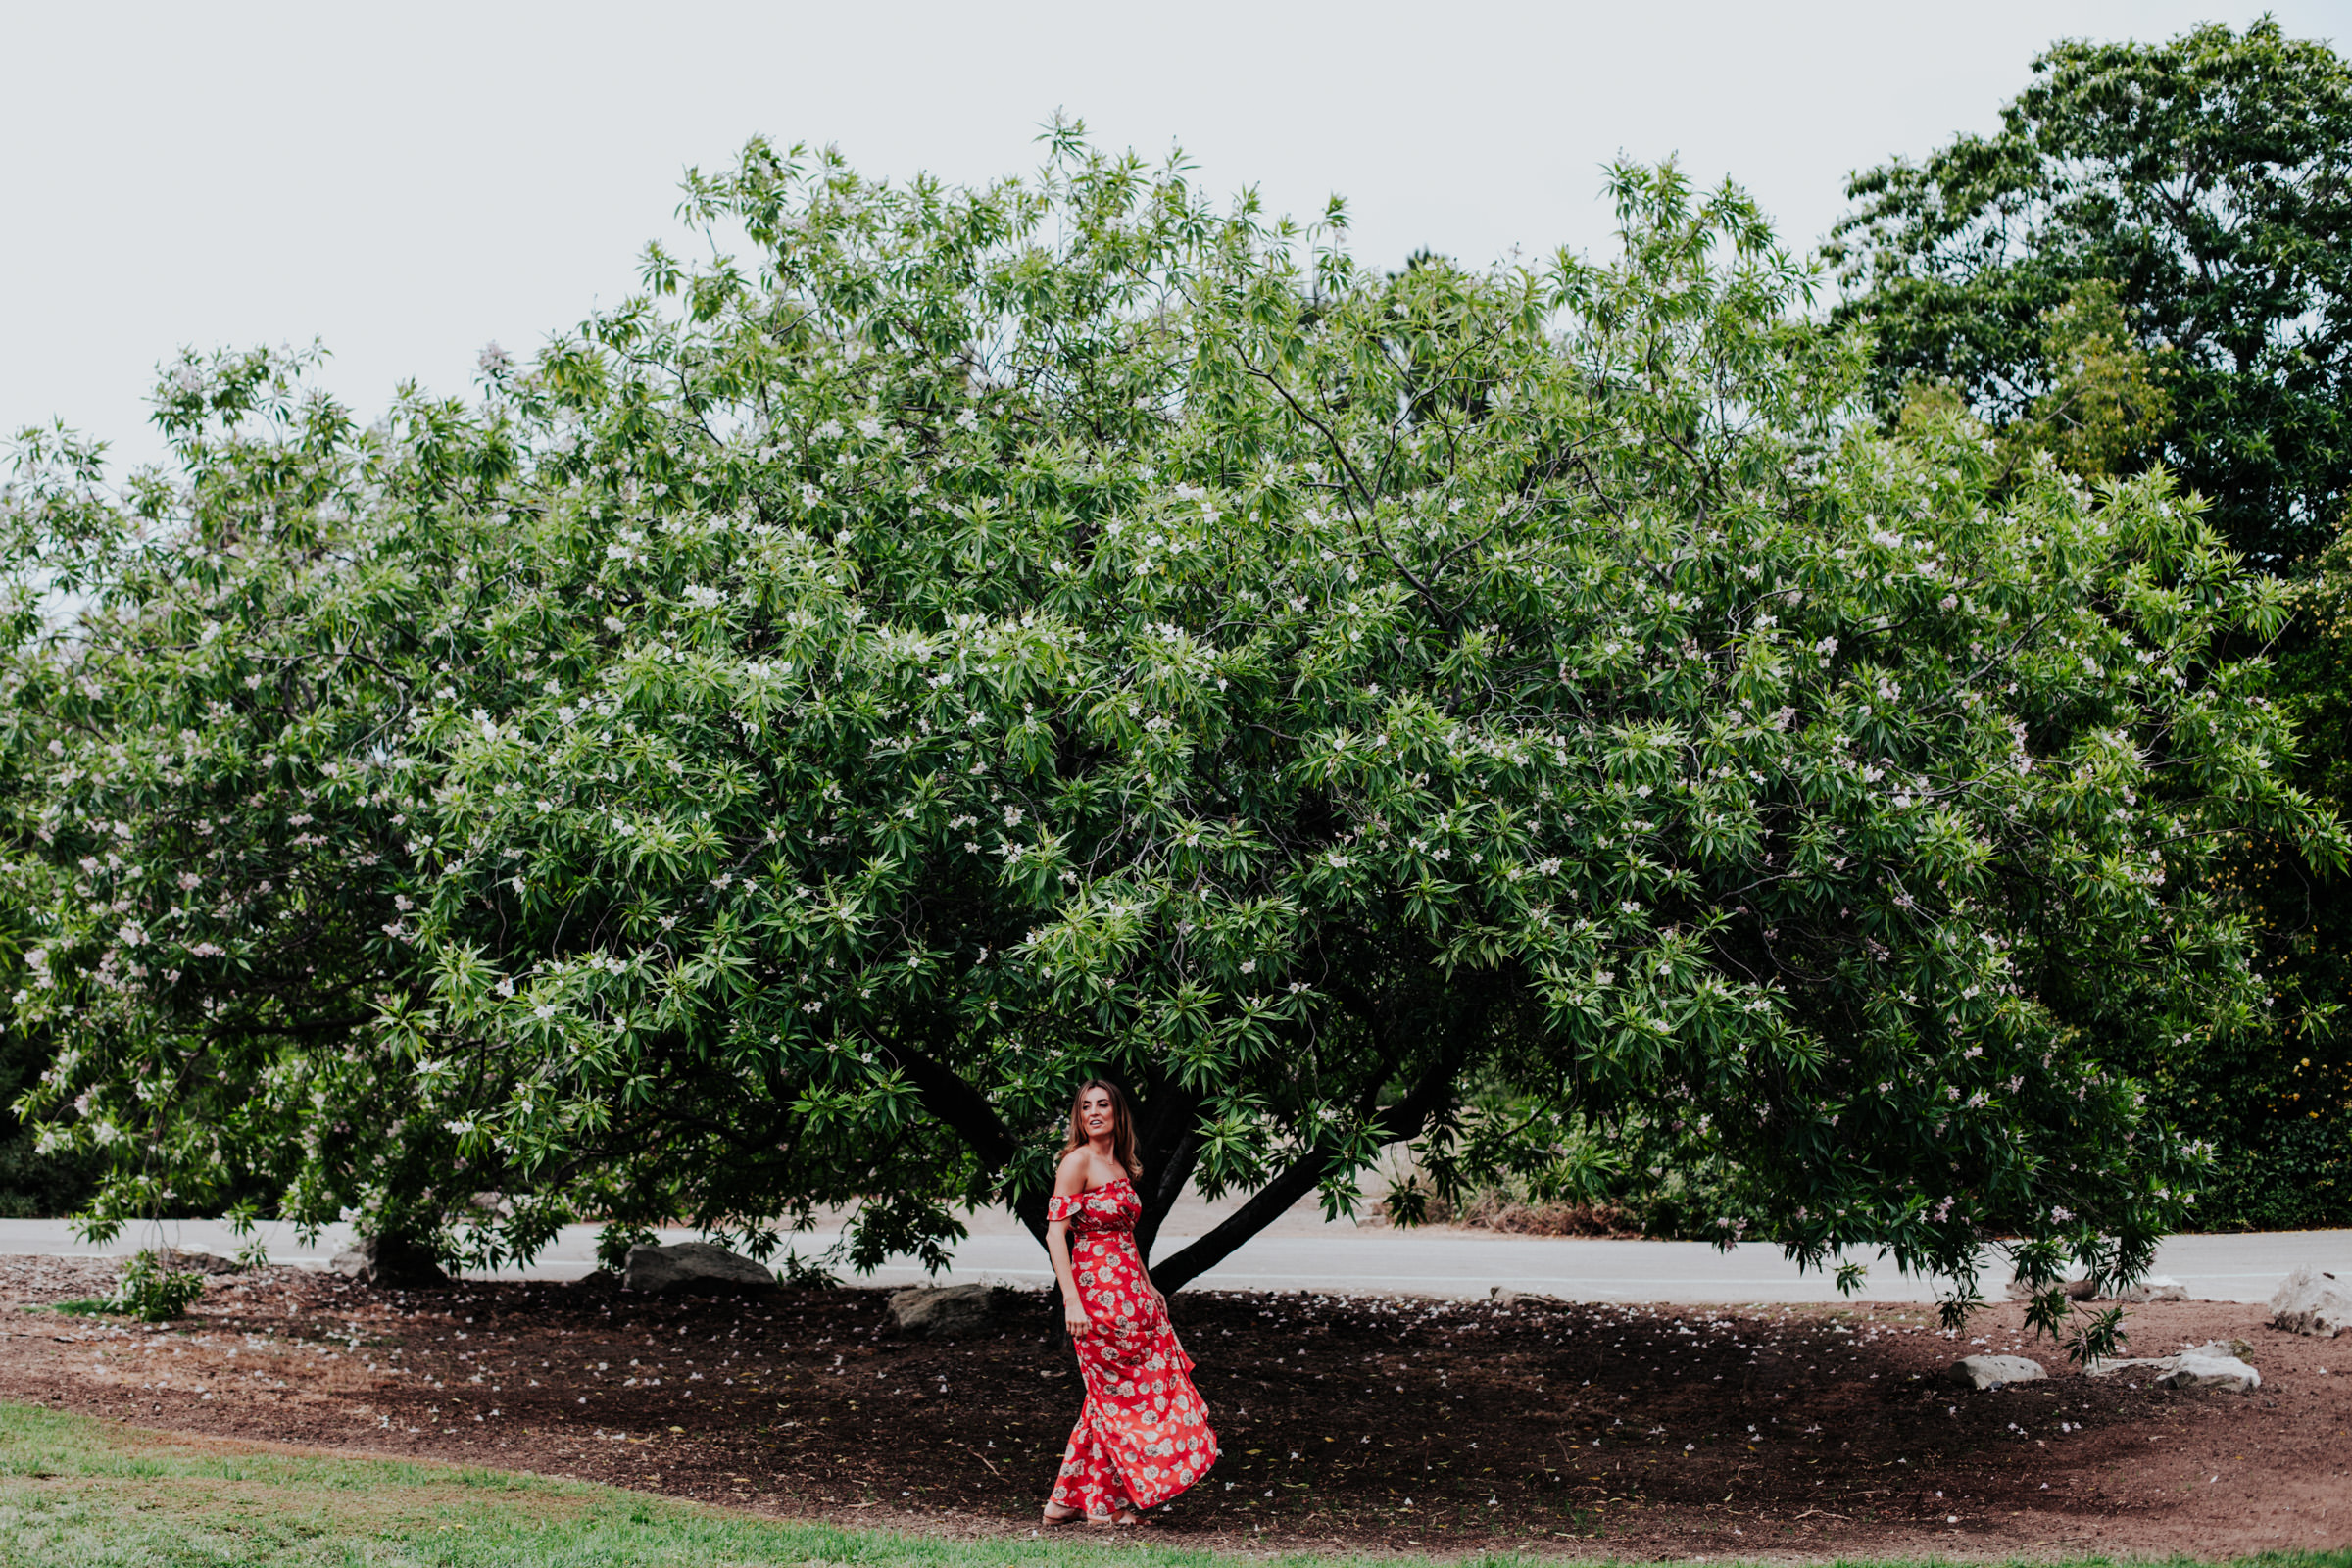 terranea-resort-palos-verdes-california-wedding-photography-cove-los-angeles-pierce-76.jpg